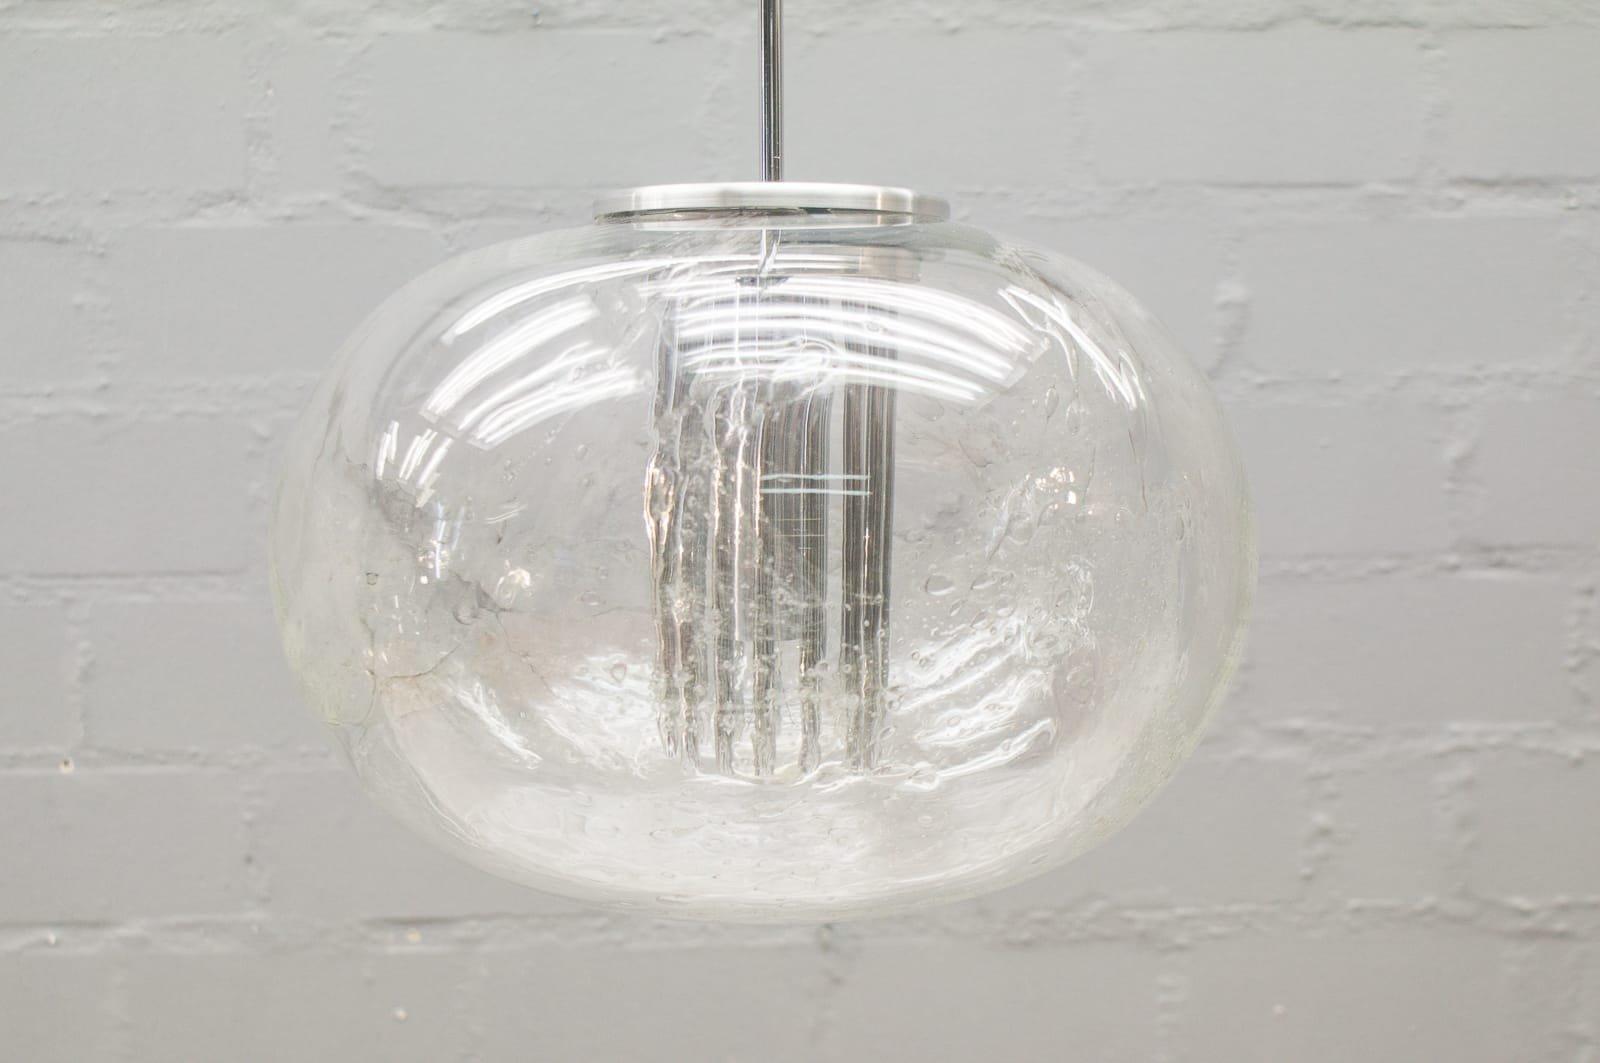 Ikea lampe deckenbefestigung: lampen decke lampensockel schlafzimmer